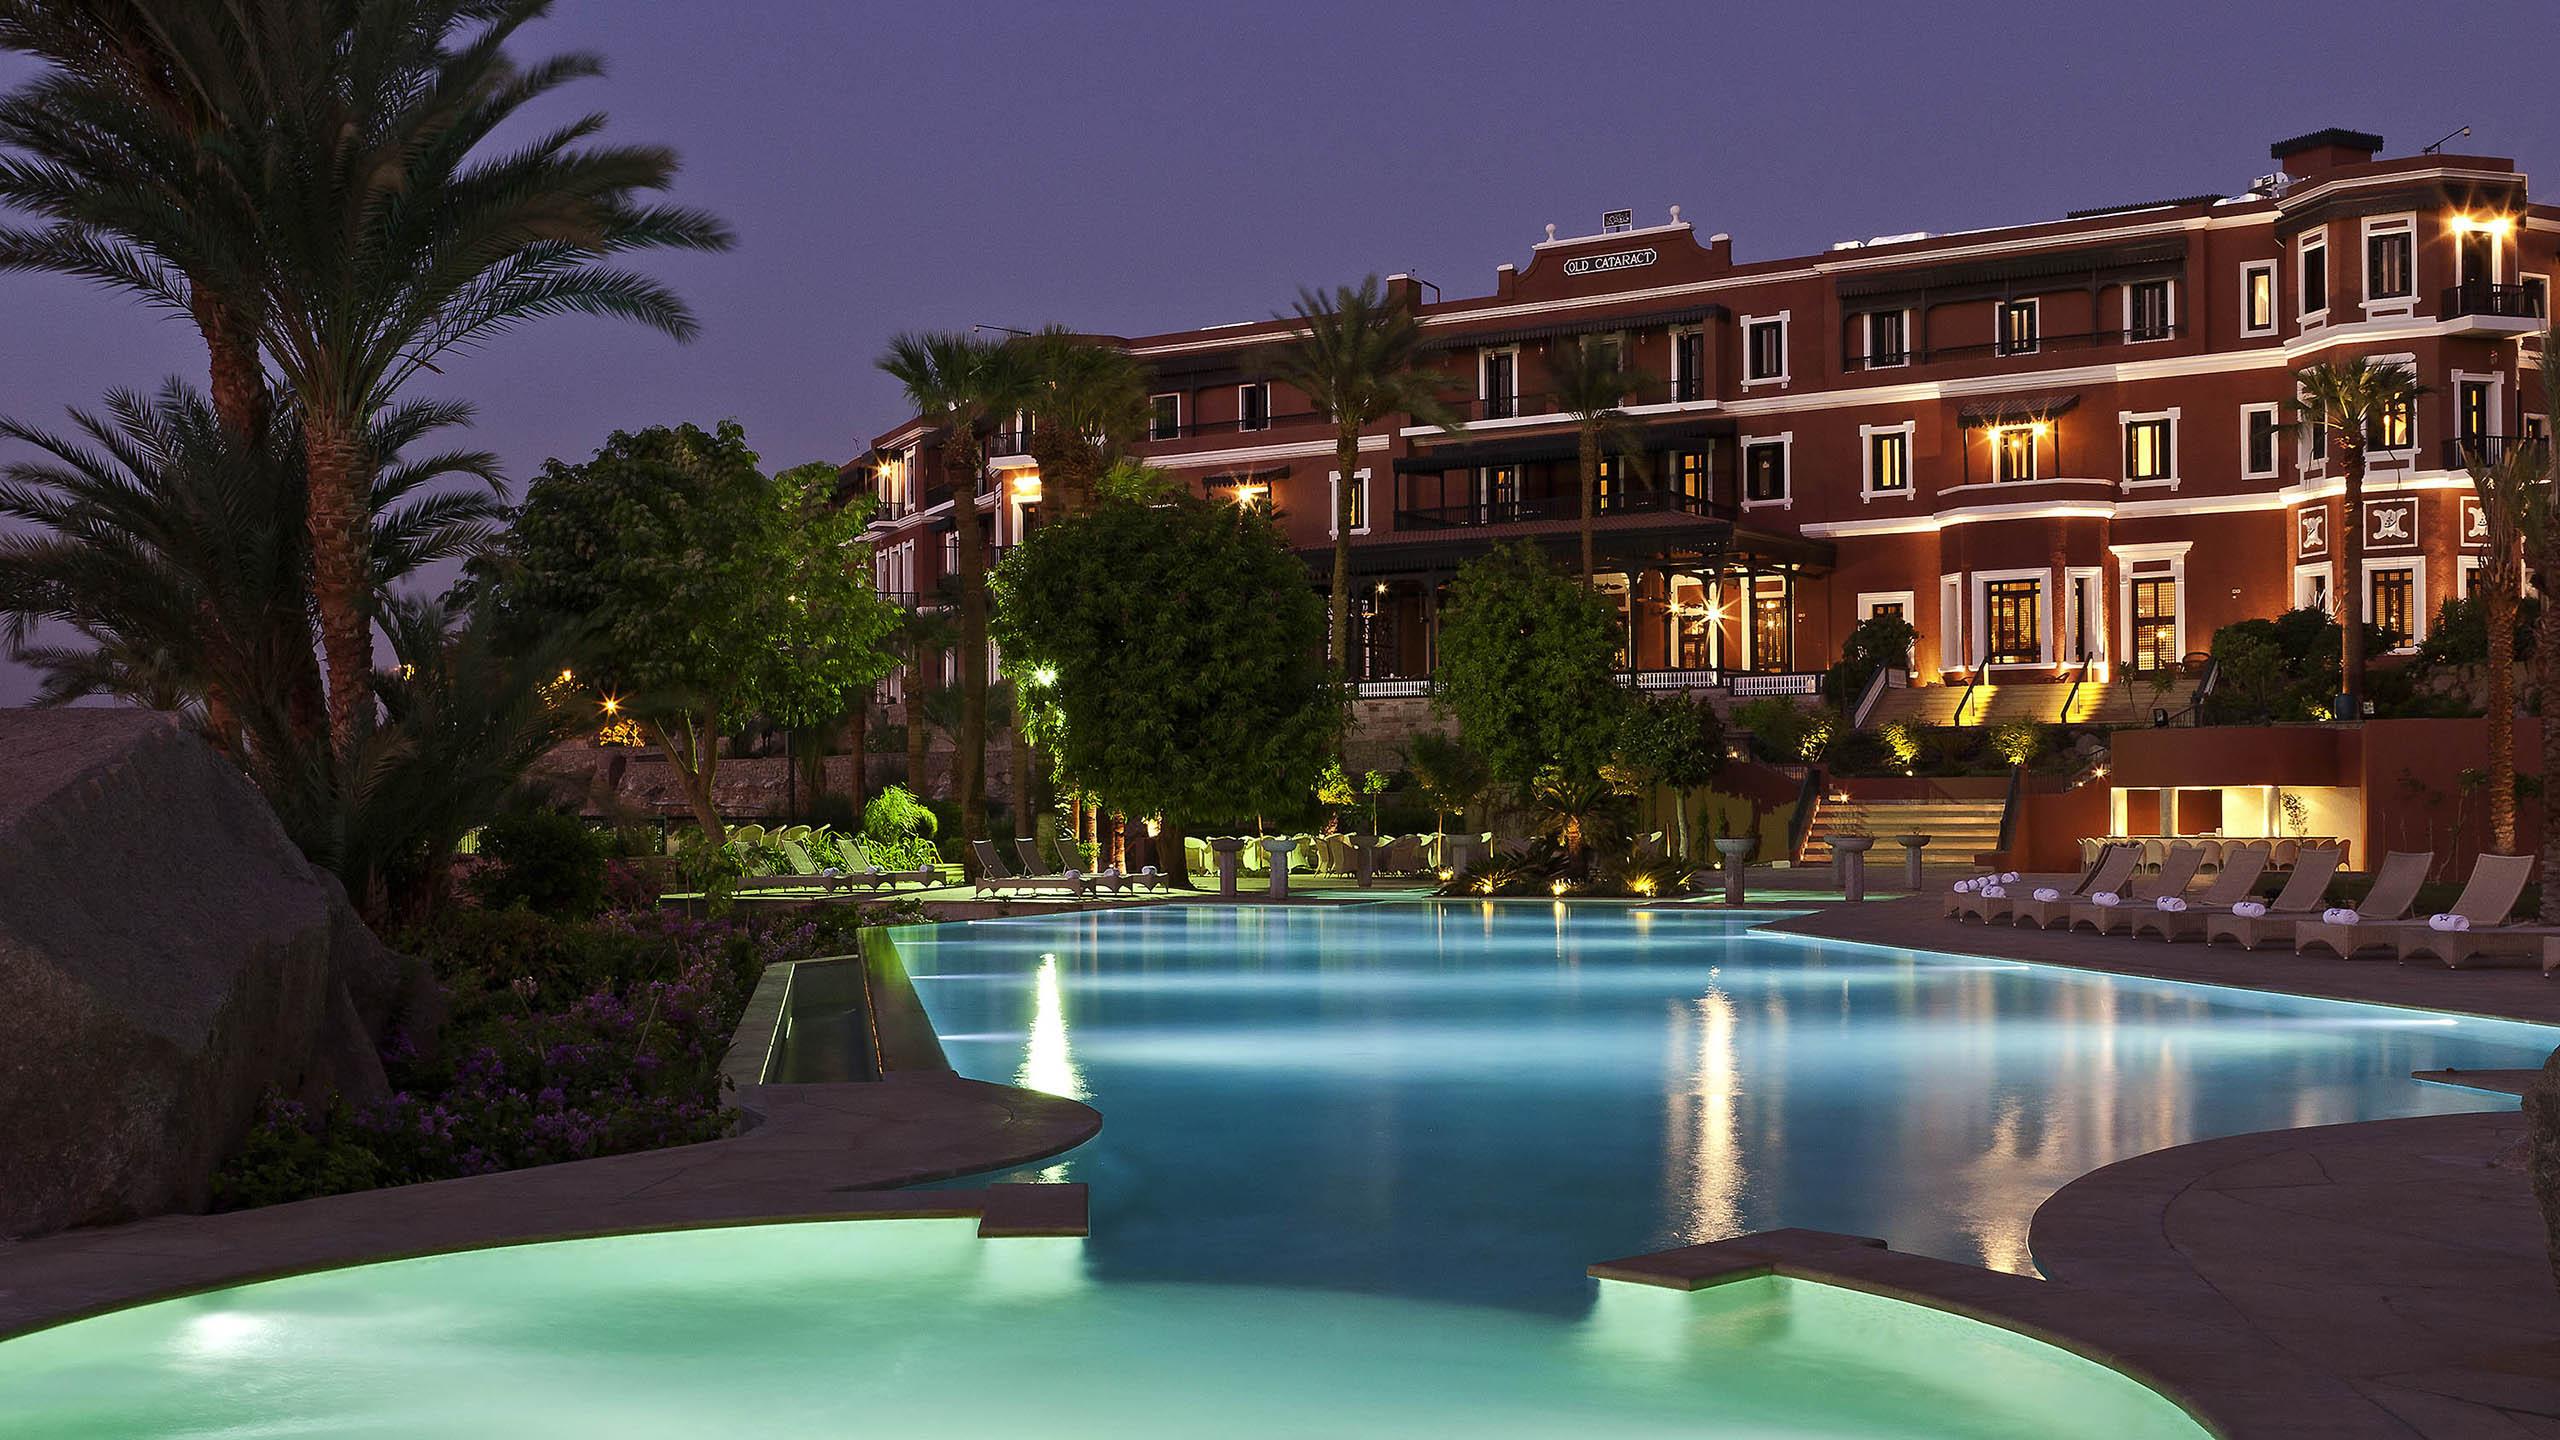 luxury hotel aswan sofitel legend old cataract aswan. Black Bedroom Furniture Sets. Home Design Ideas